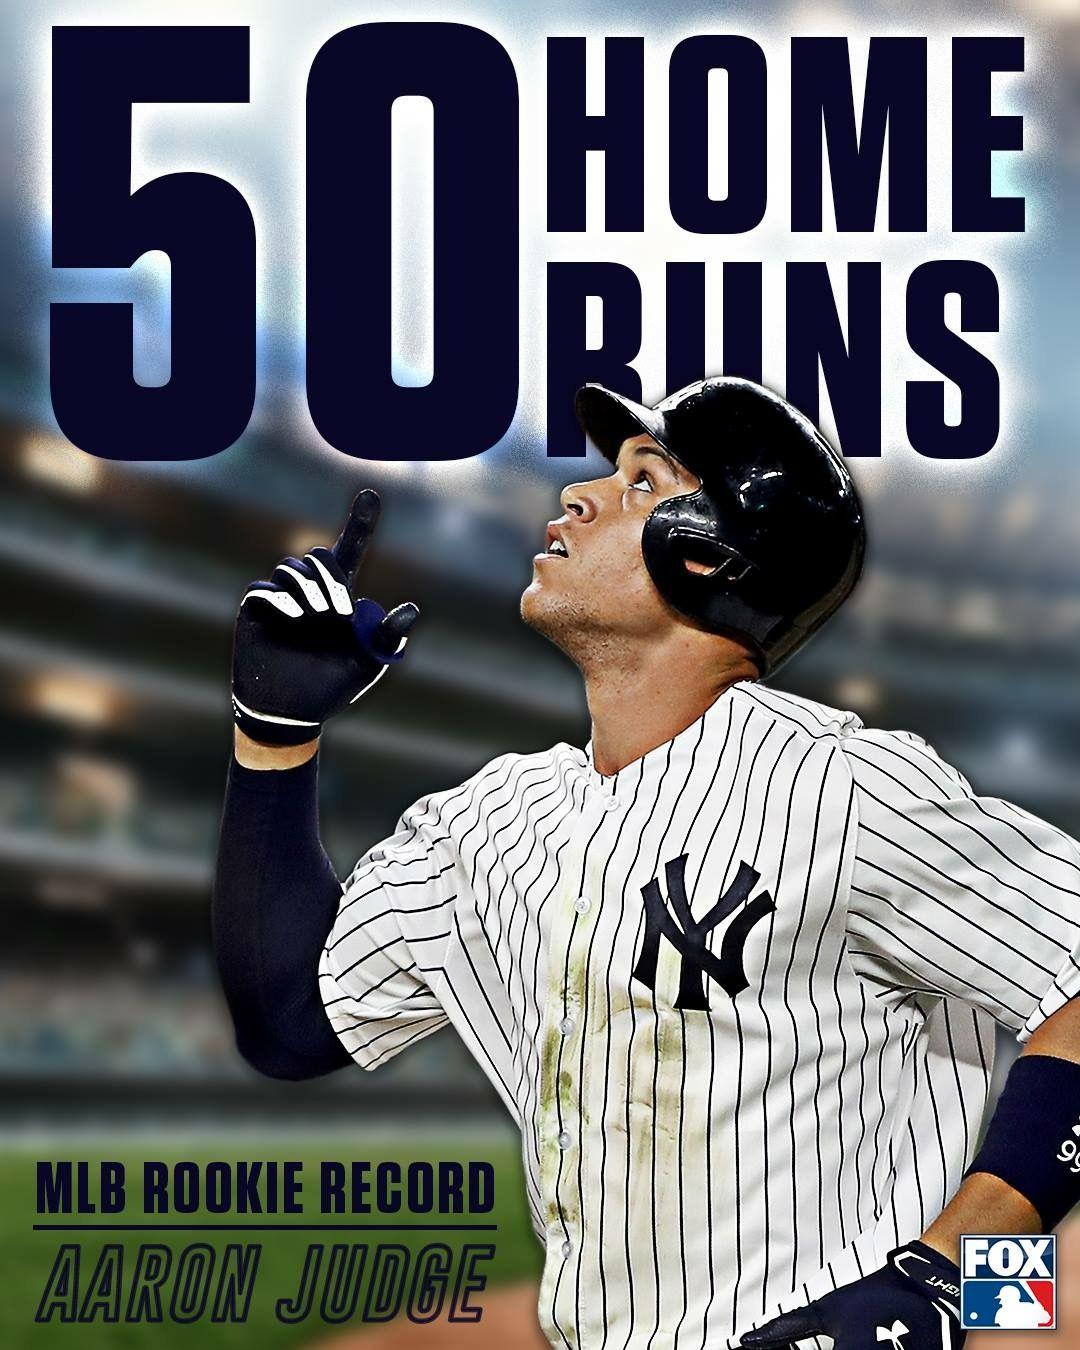 Pin By Emma Barbour On Aaron Judge Yankees Baseball Yankees Fan Yankees